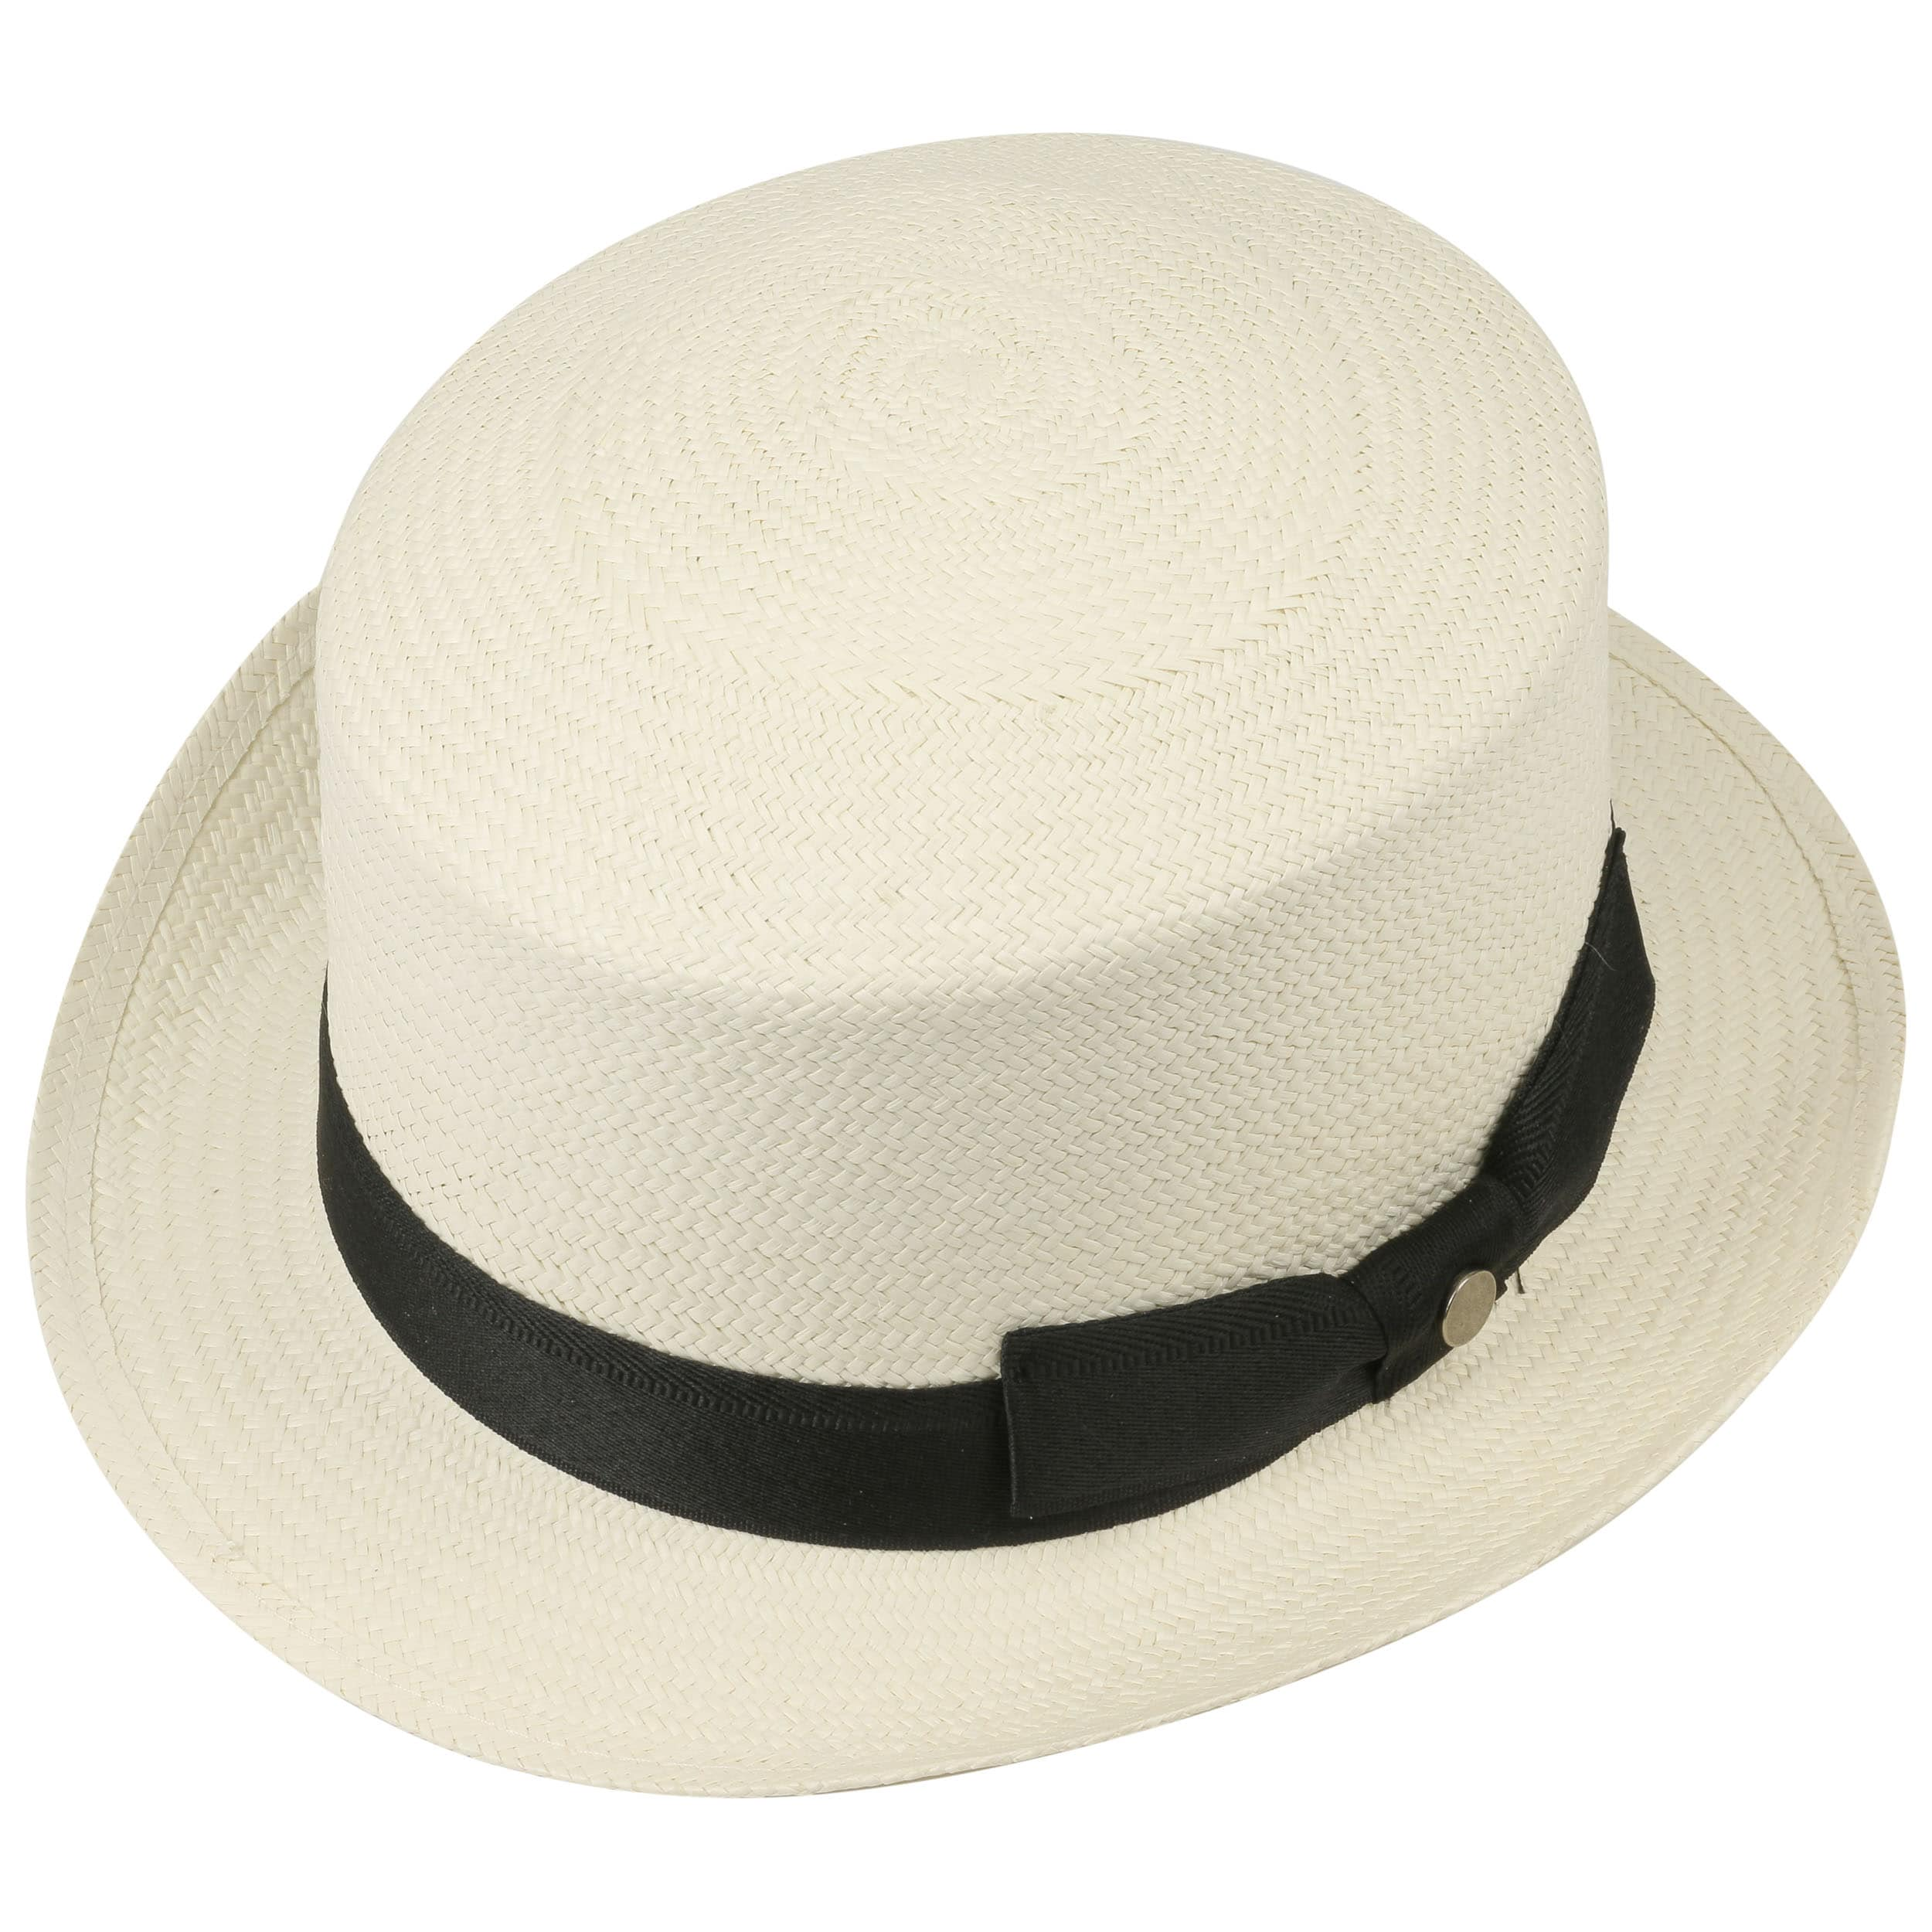 Cappello Cilindro Panama by Lierys - bianco crema 1 ... 3425e3c7aa0e